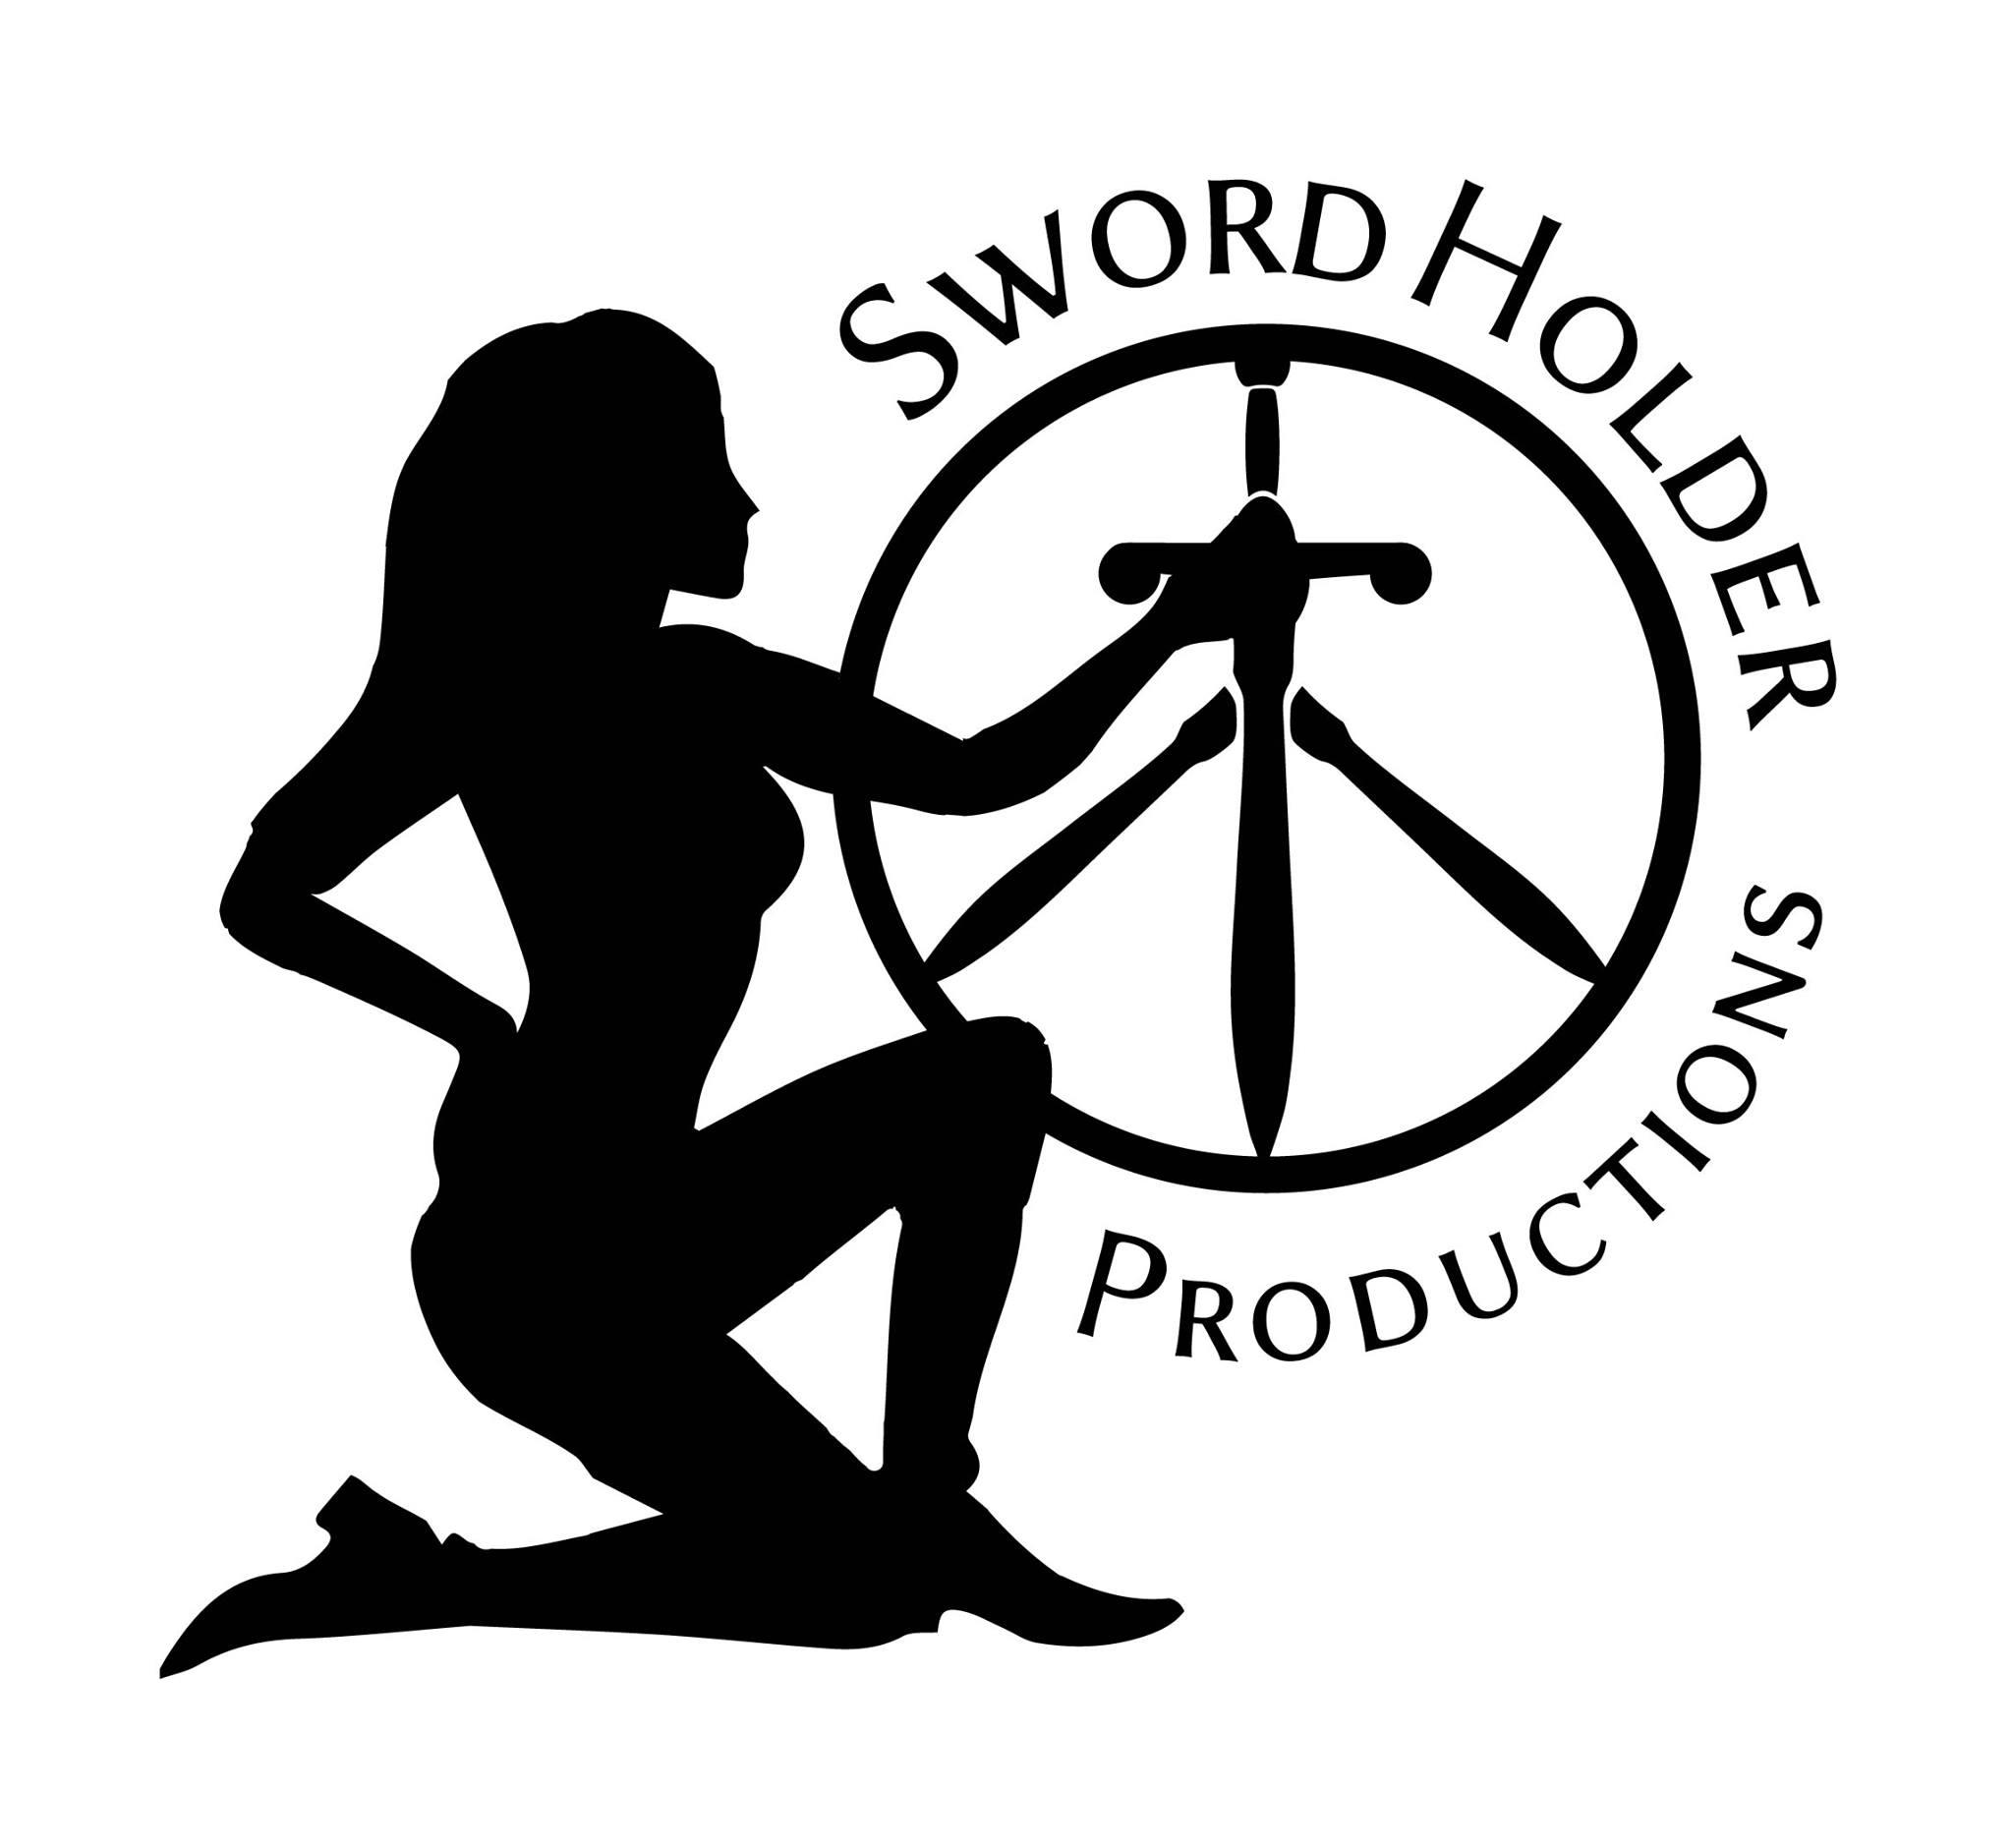 swordholderproductionslogo.jpg